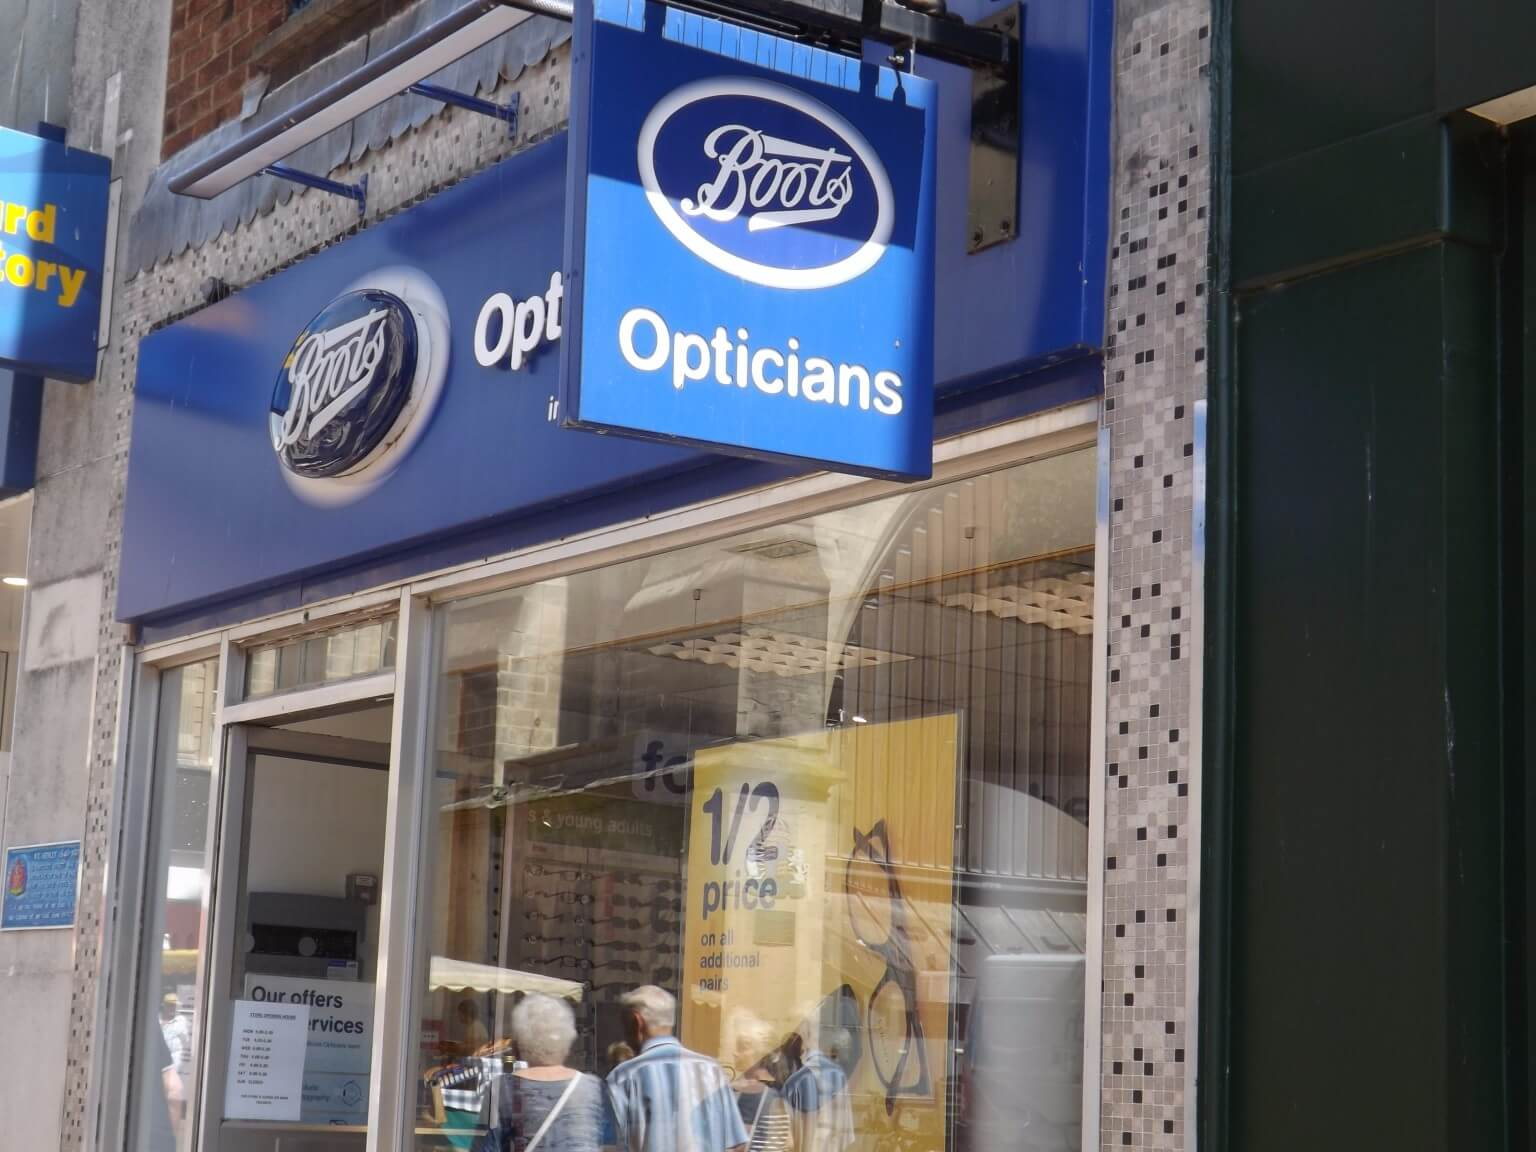 8ac170bda703 Boots Opticians - Gloucester BID